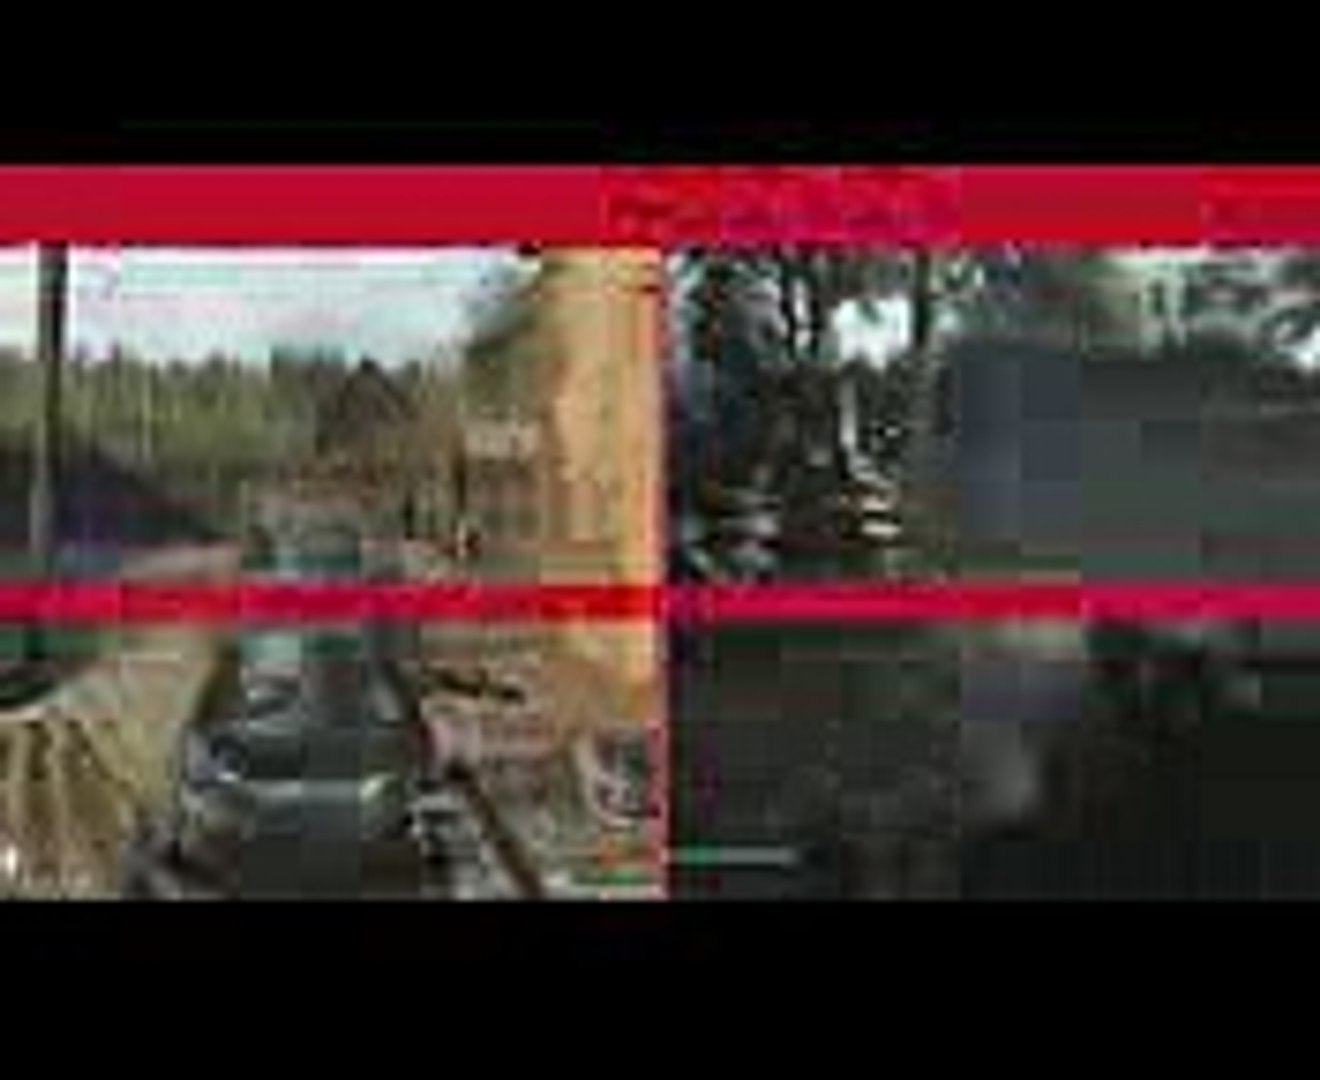 Call of Duty (2003) vs Call of Duty WW2 Graphics Comparison